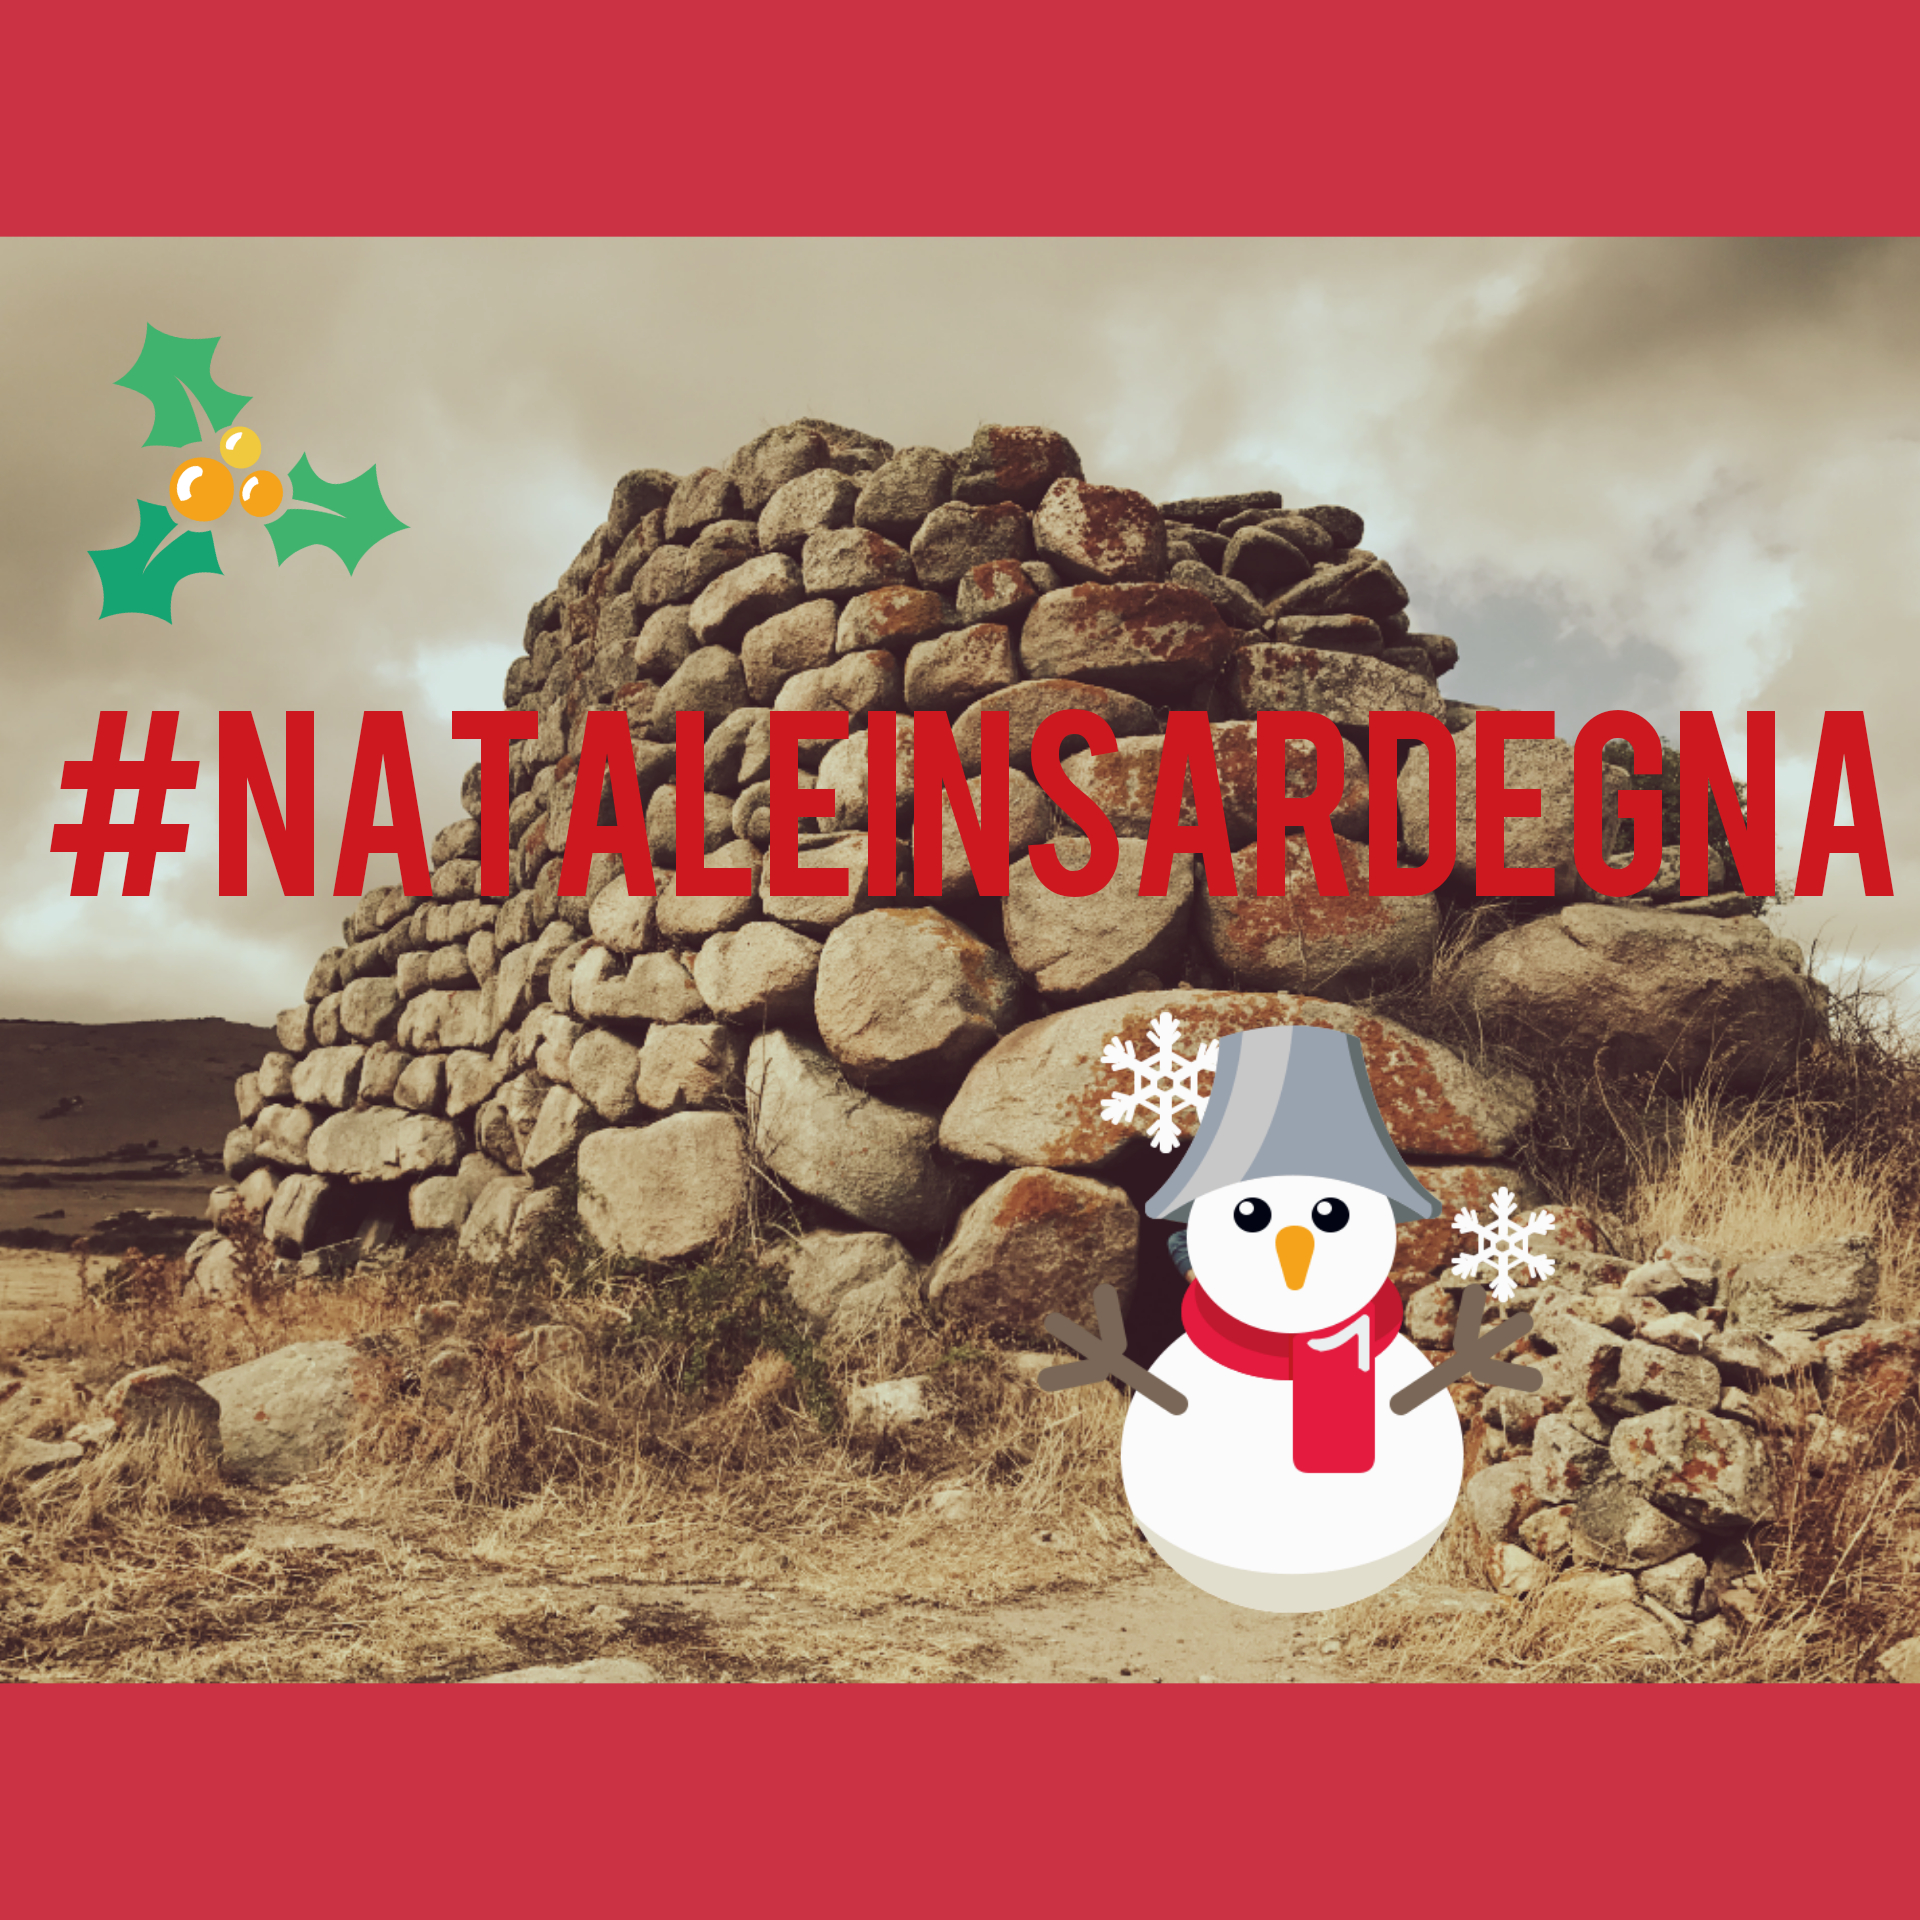 #nataleinsardegna